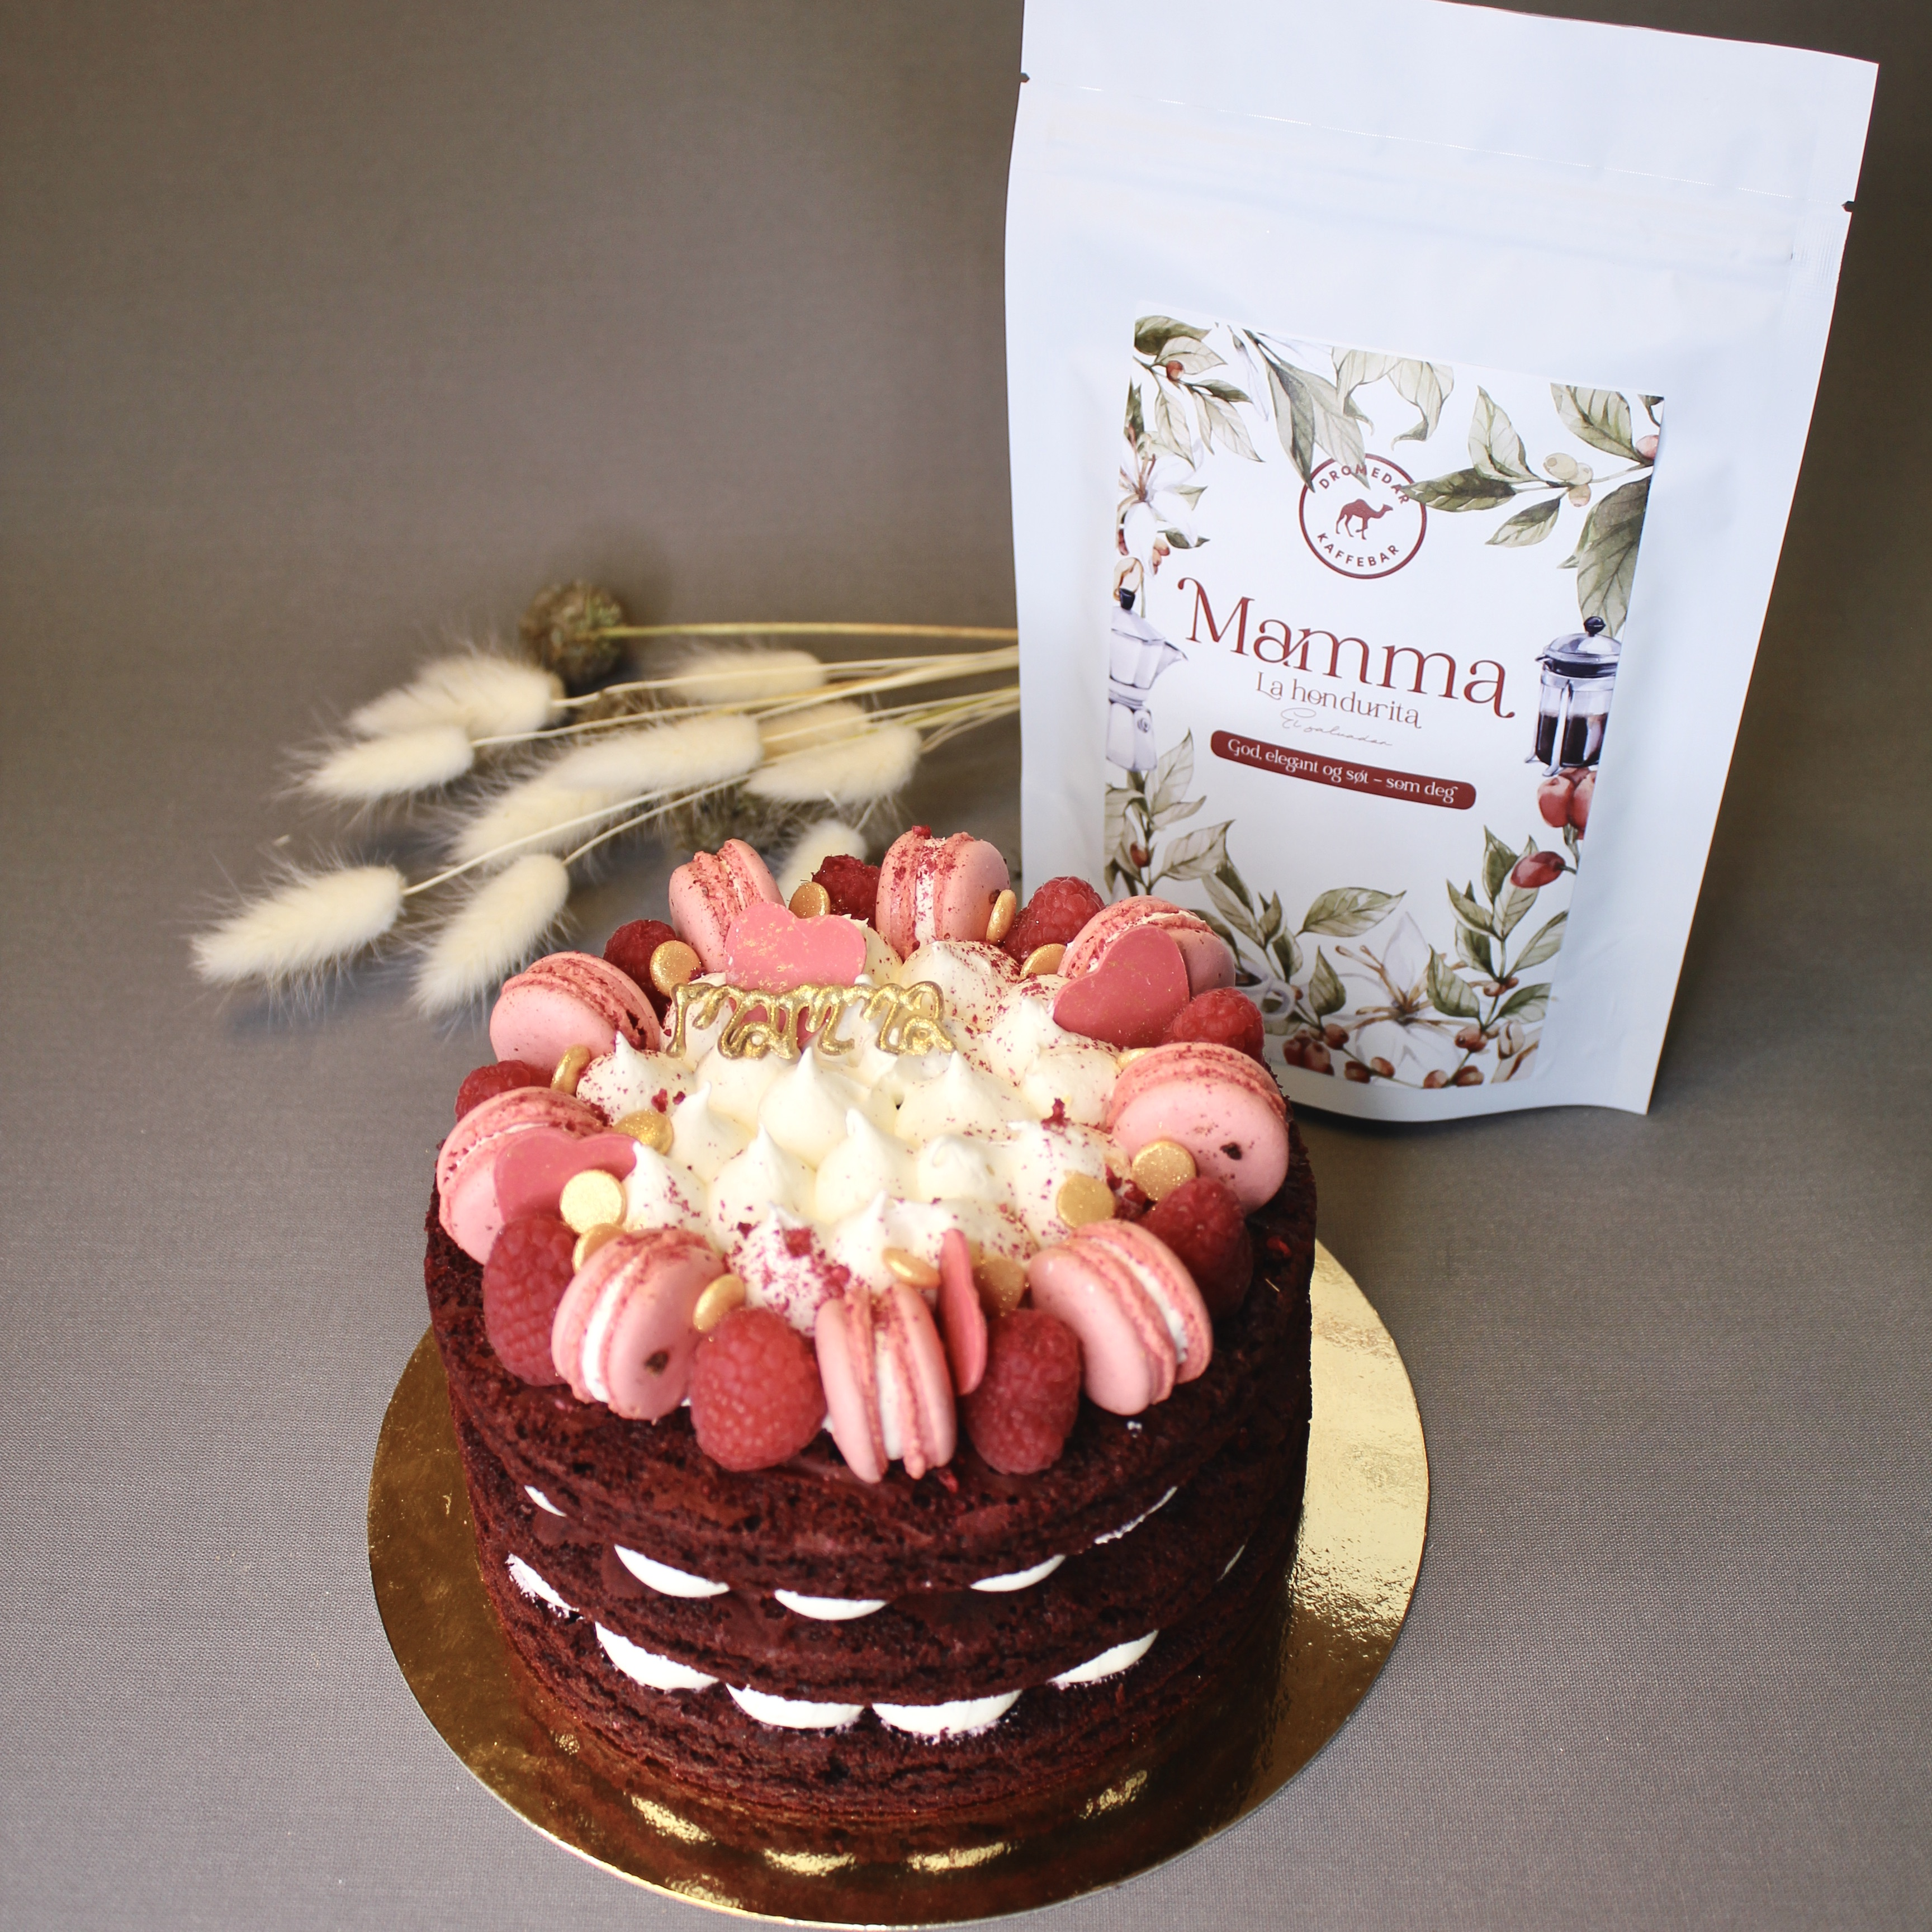 Mamma/Valentin kake